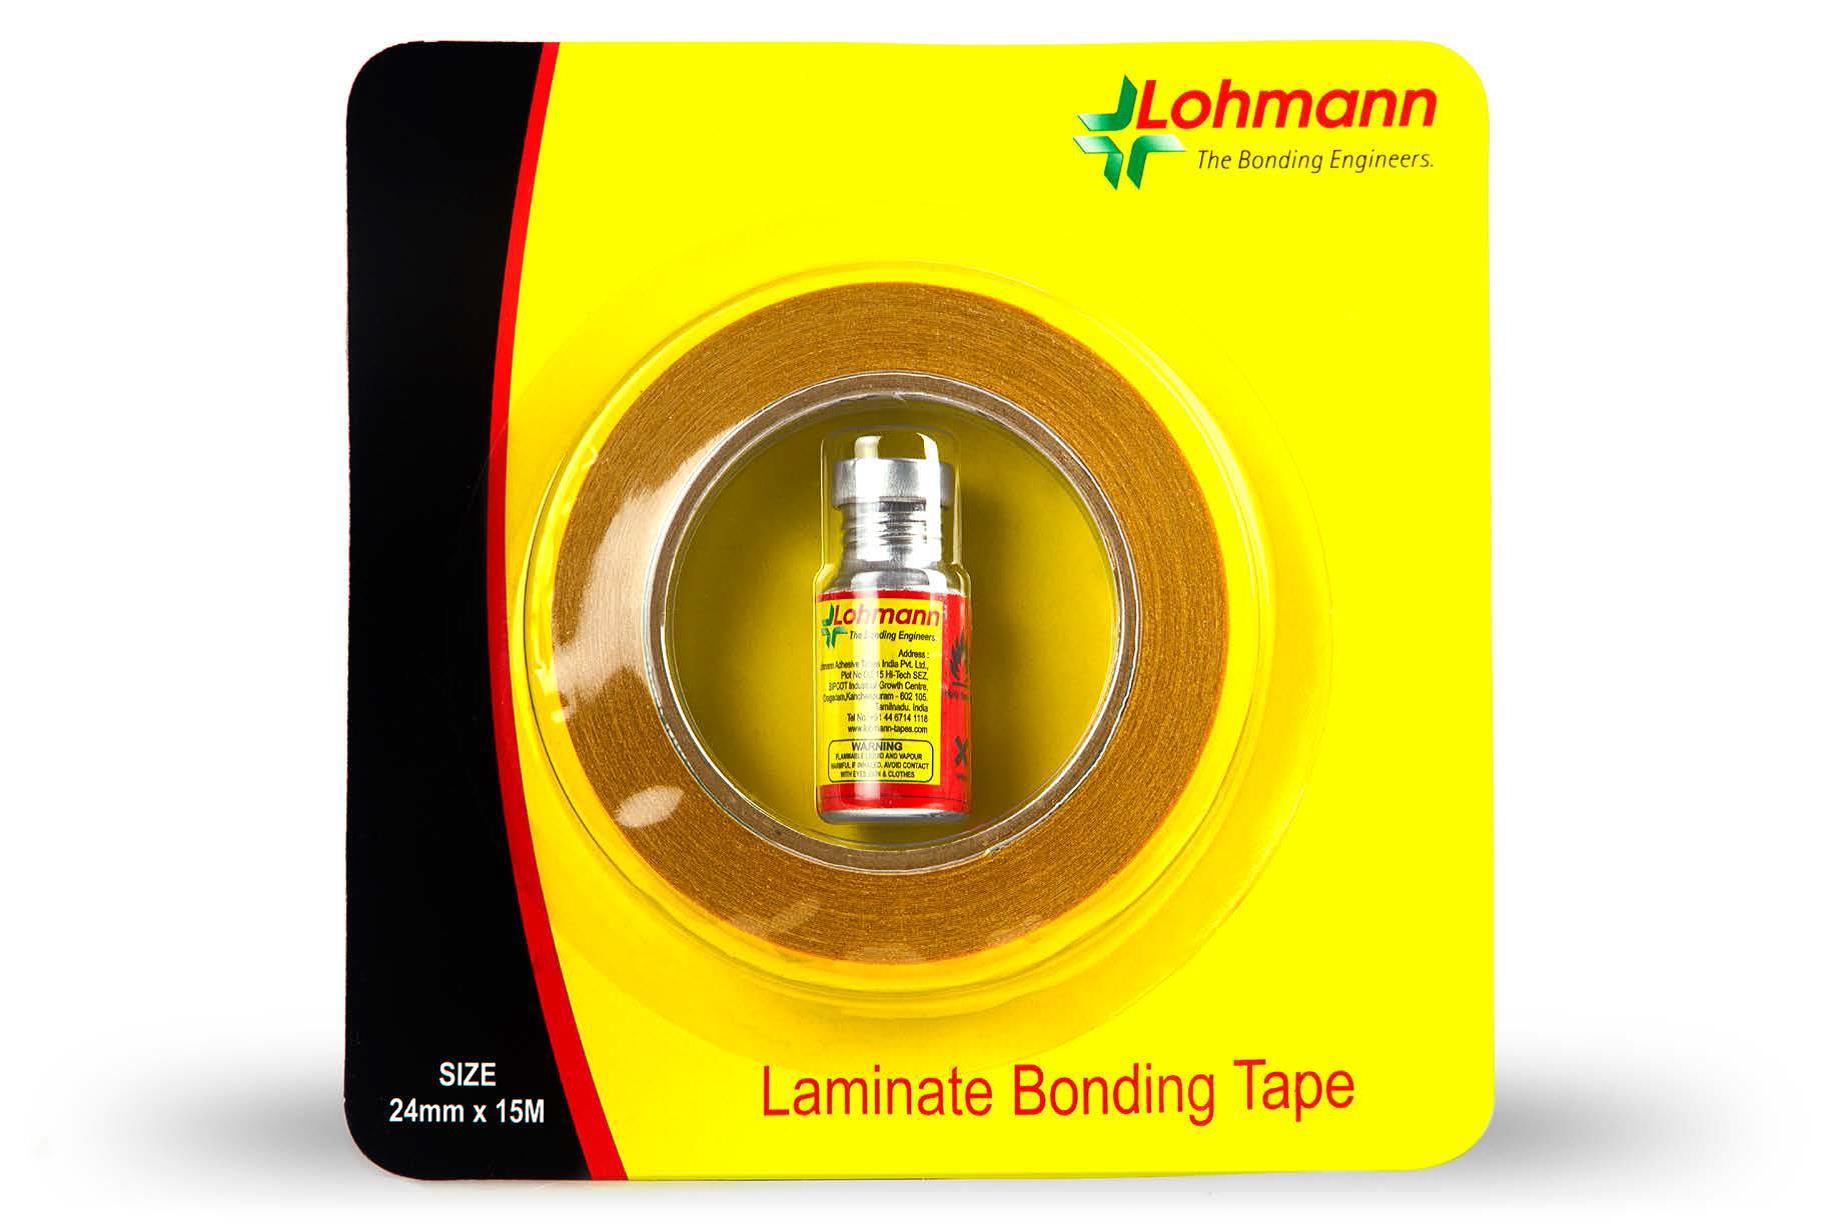 Lohmann Laminate Bonding Tape